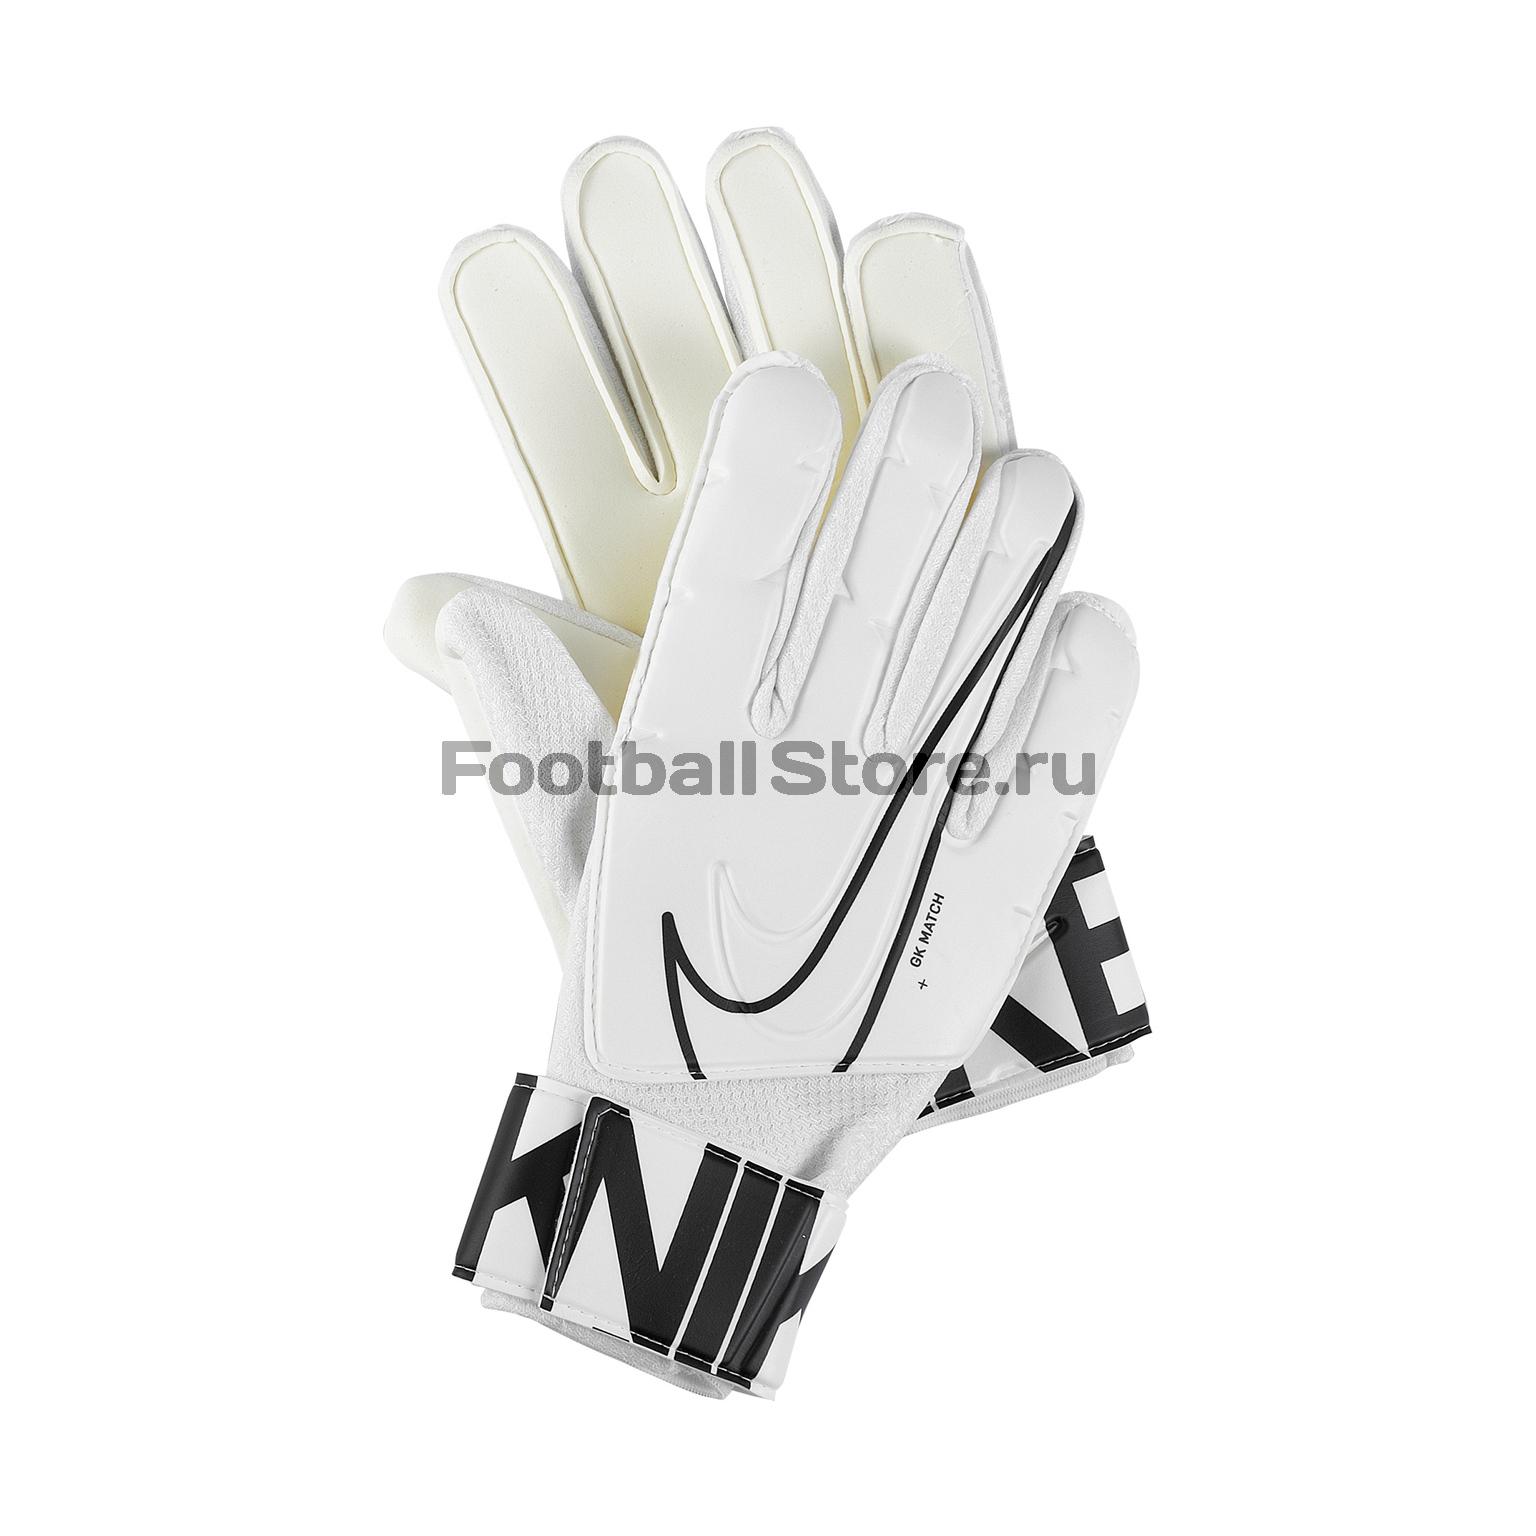 Перчатки вратарские Nike Match GS3882-100